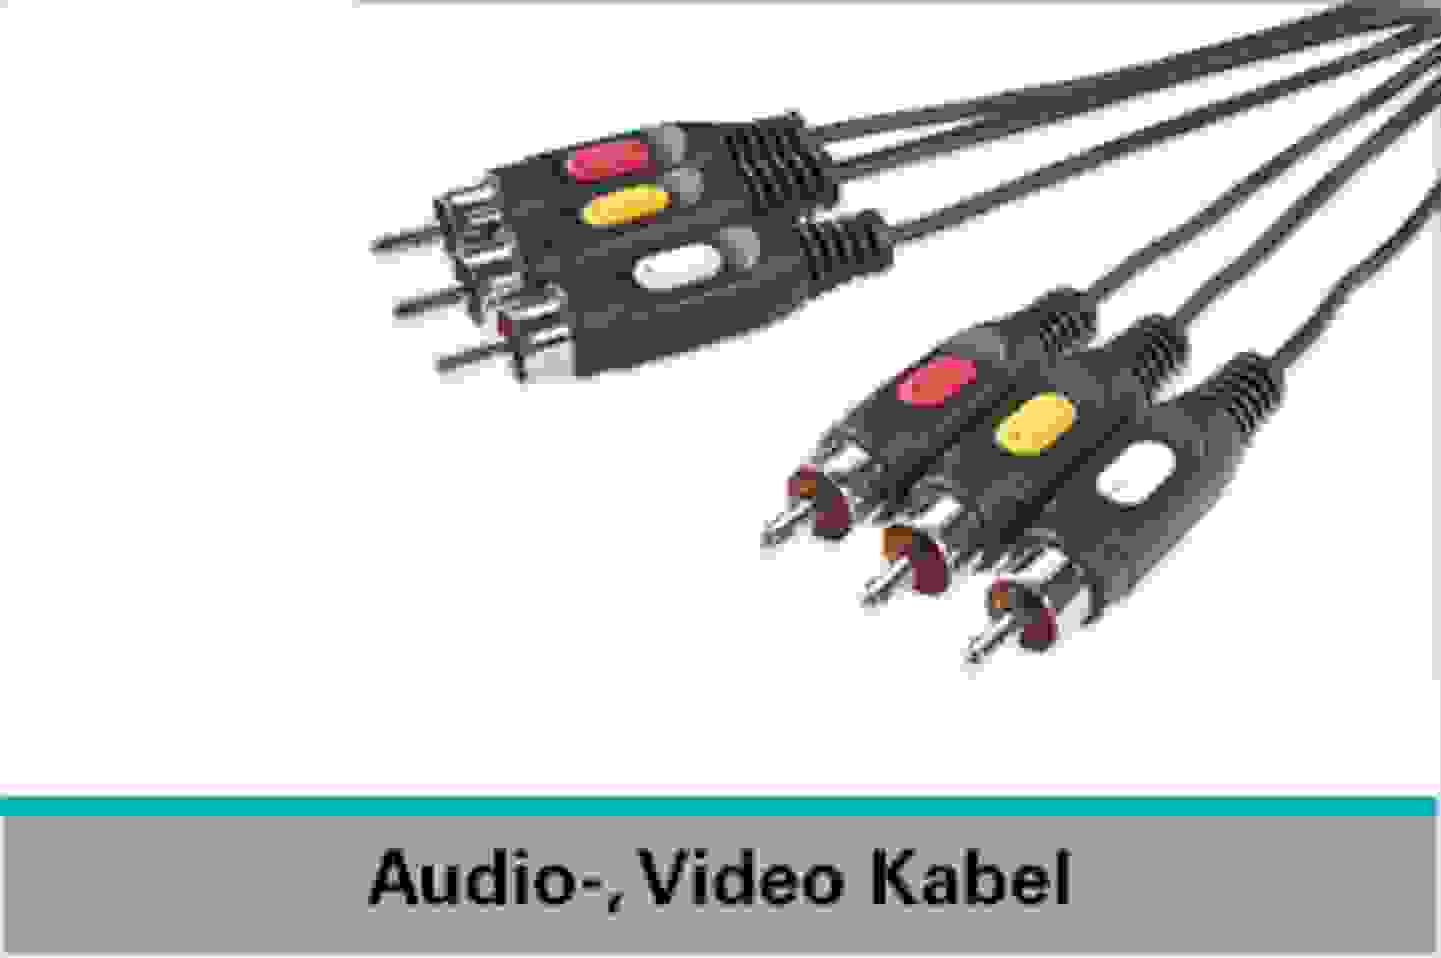 Speaka Professional Audio-, Video-Kabel